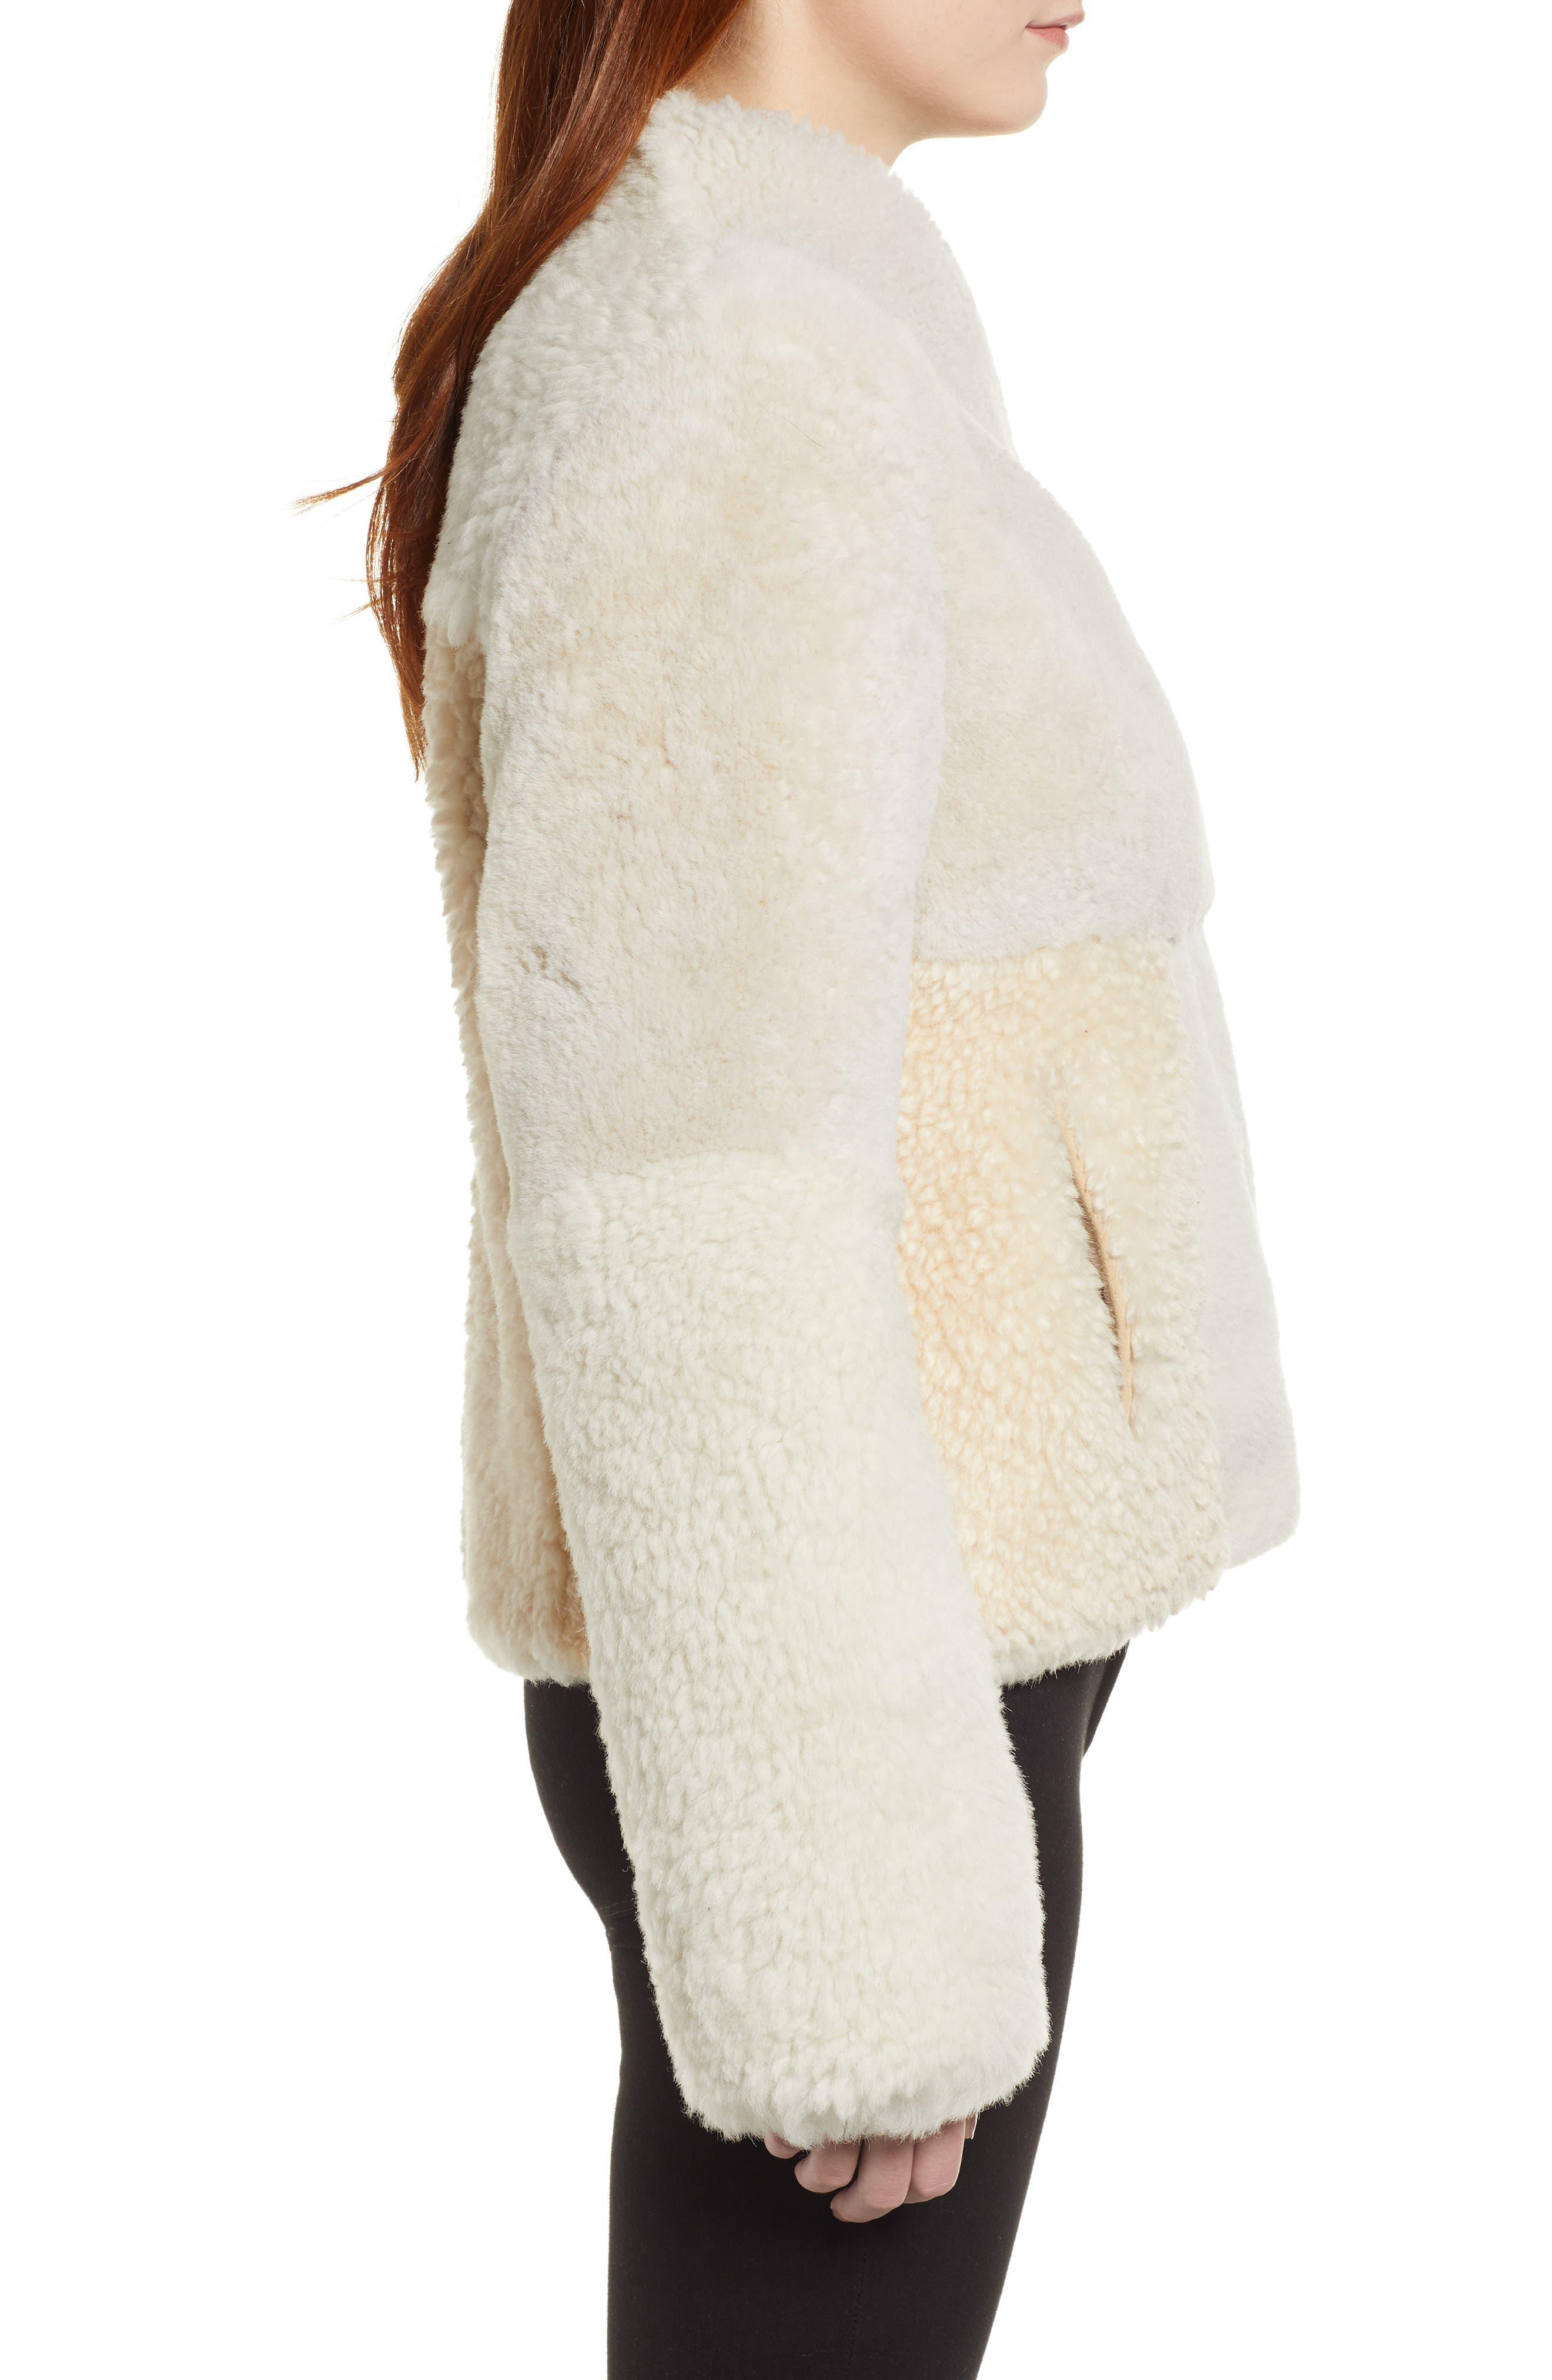 Patchwork Genuine Shearling Jacket,                             Alternate thumbnail 3, color,                             CREAM